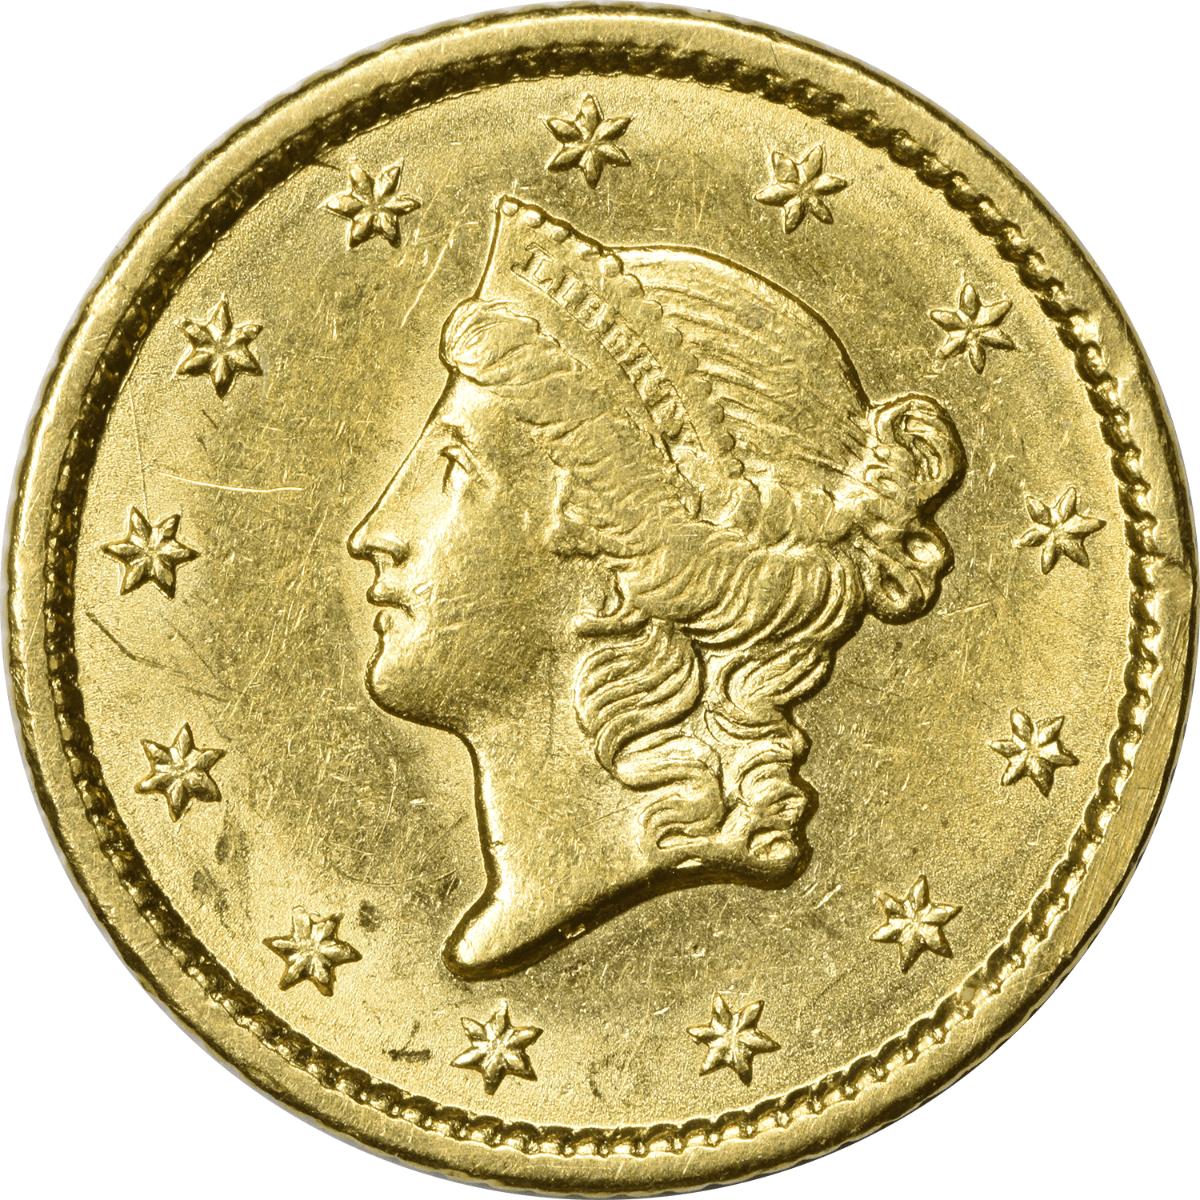 1849 $1 Gold Type 1 Open Wreath MS60 Uncertified